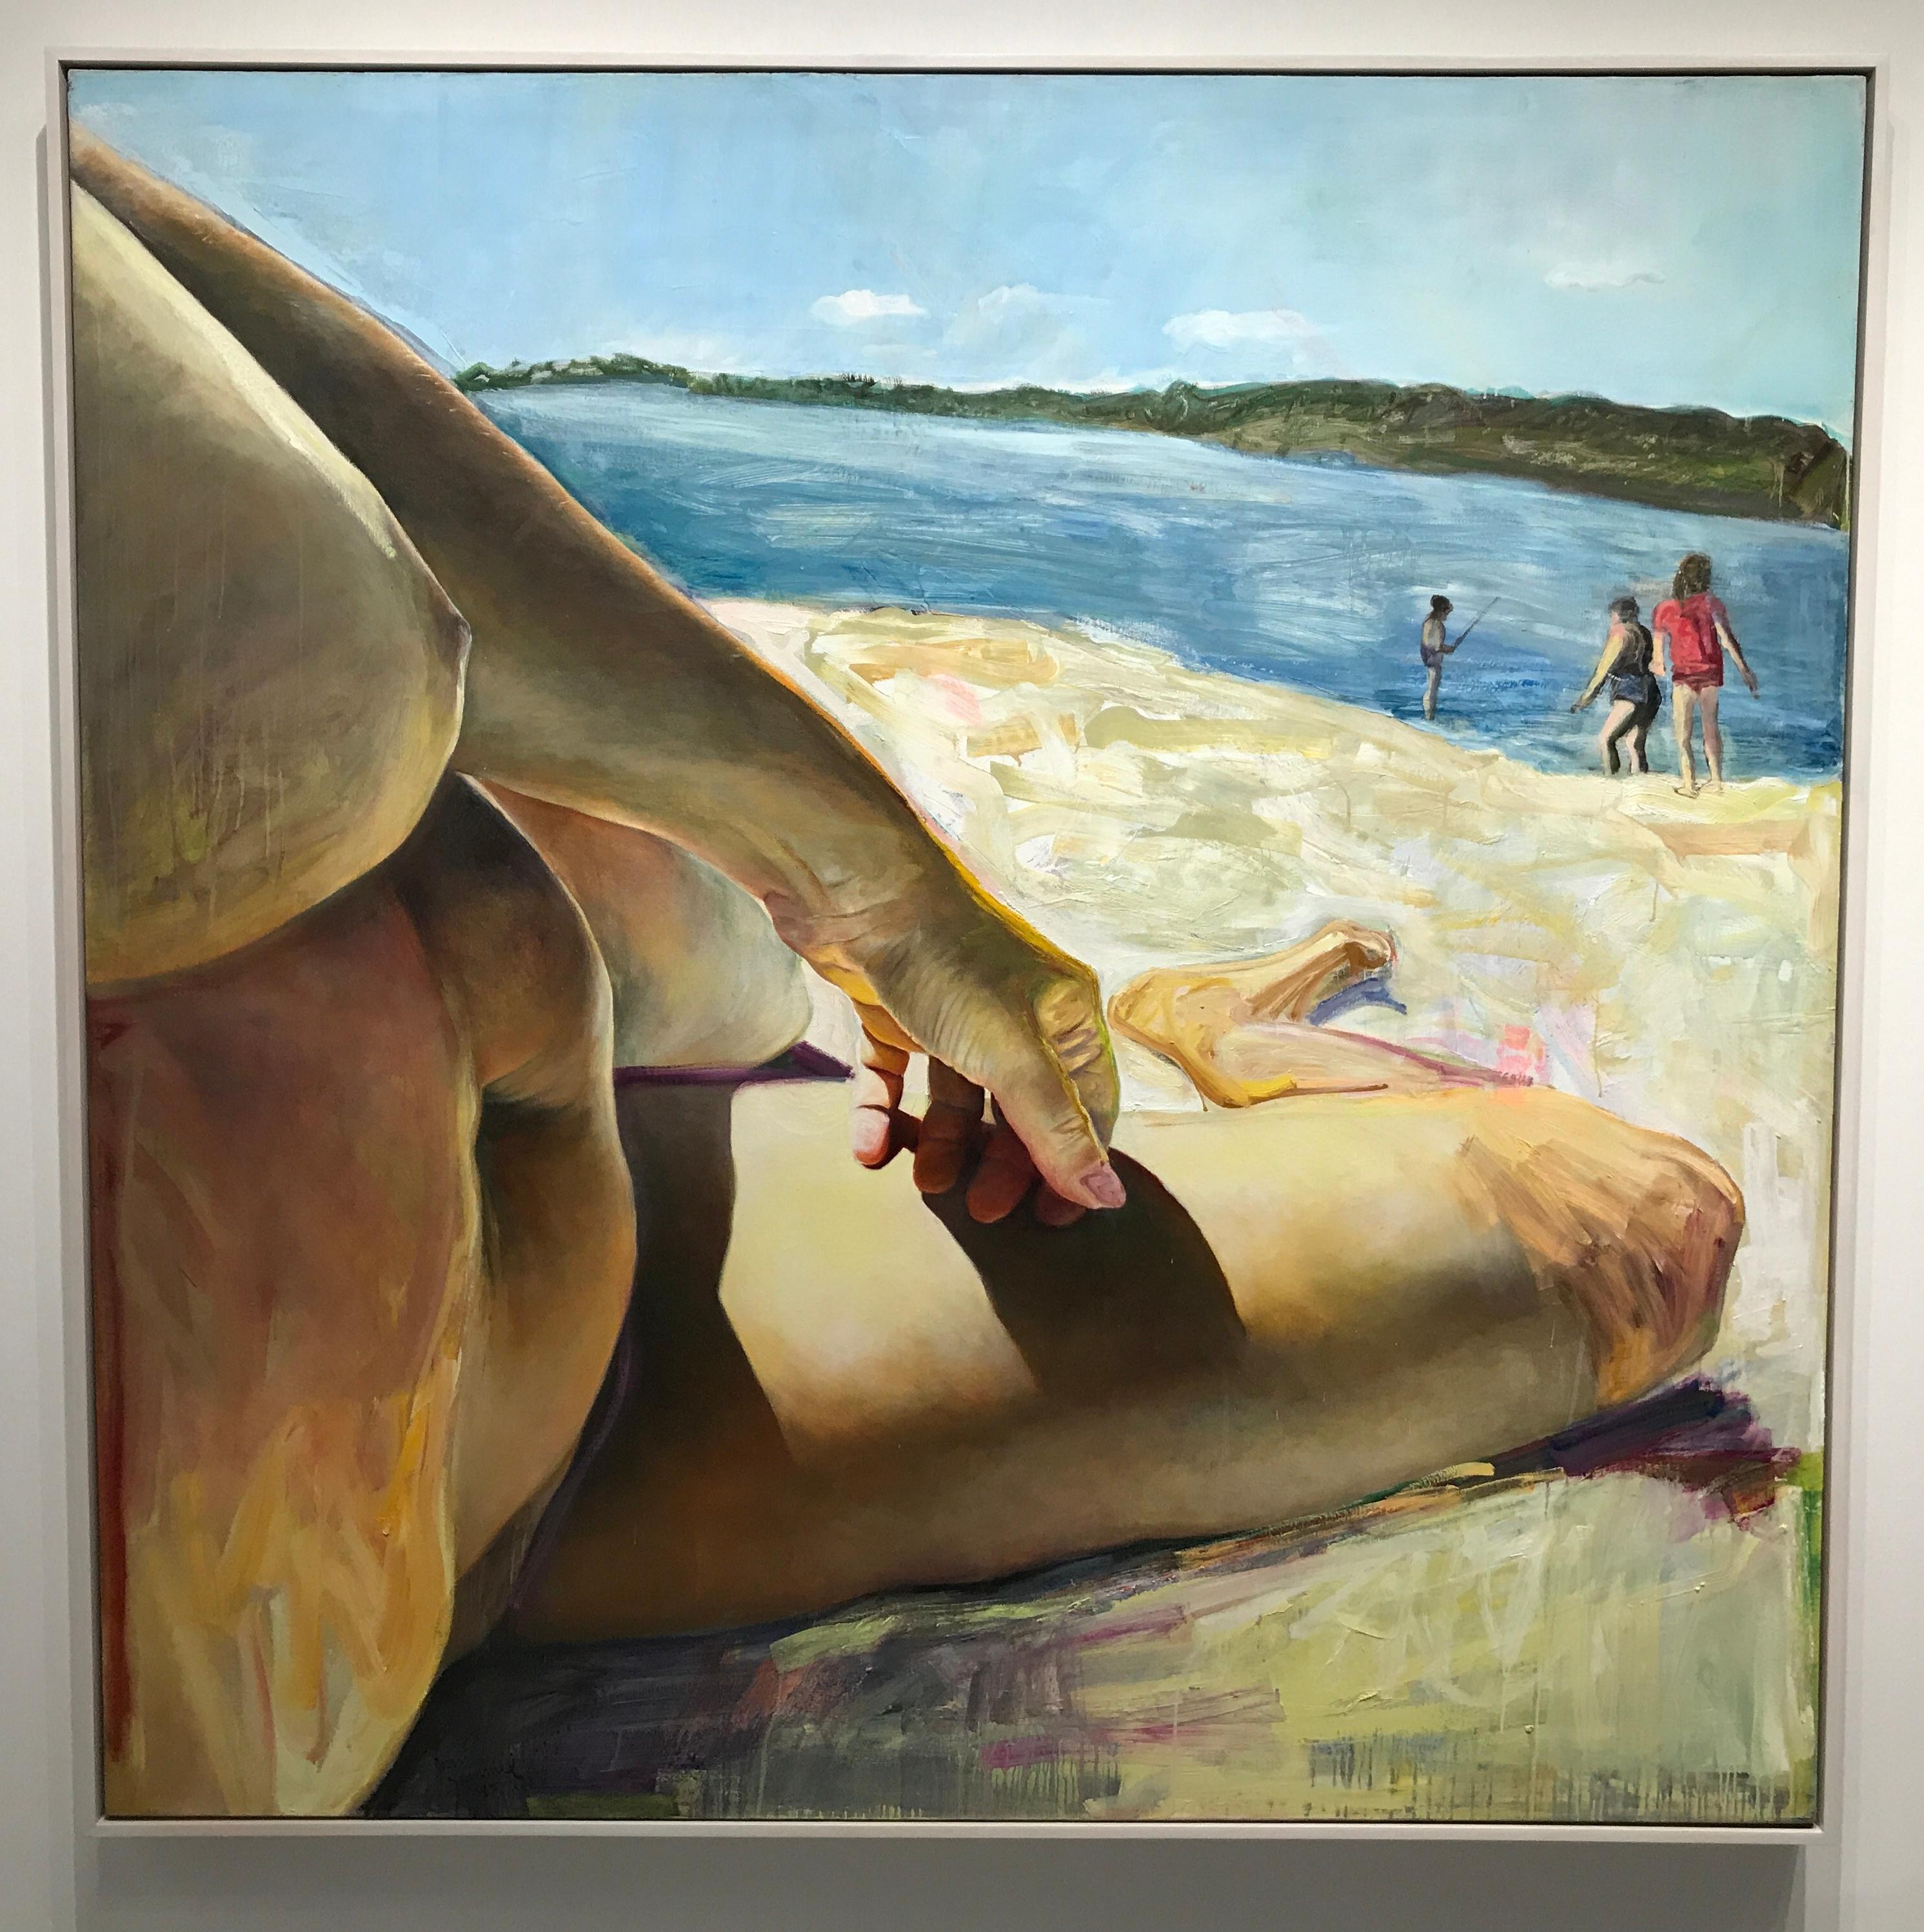 Joan Semmel Beachbody 1985